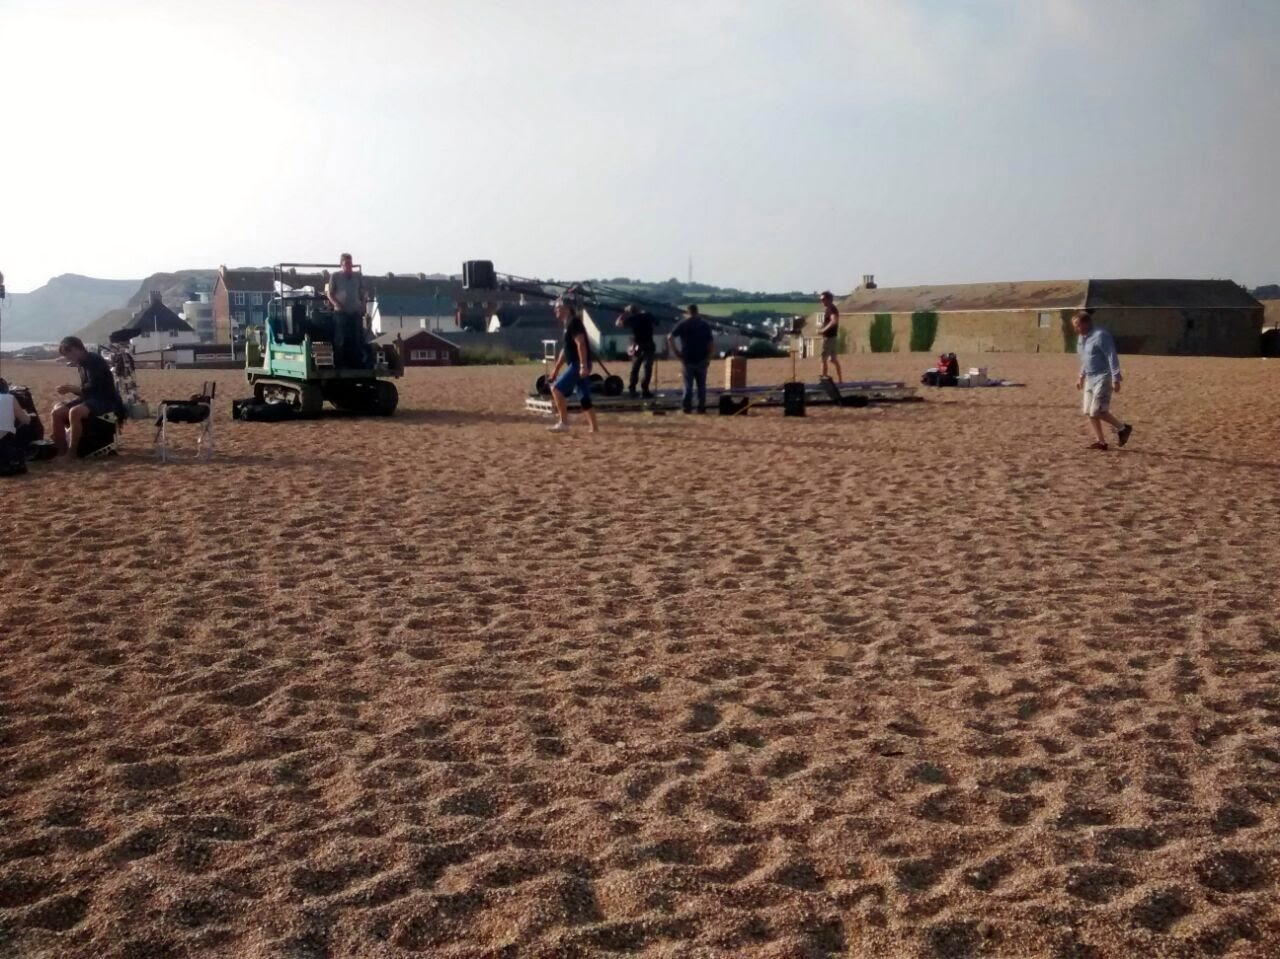 broadchurch filming series 2